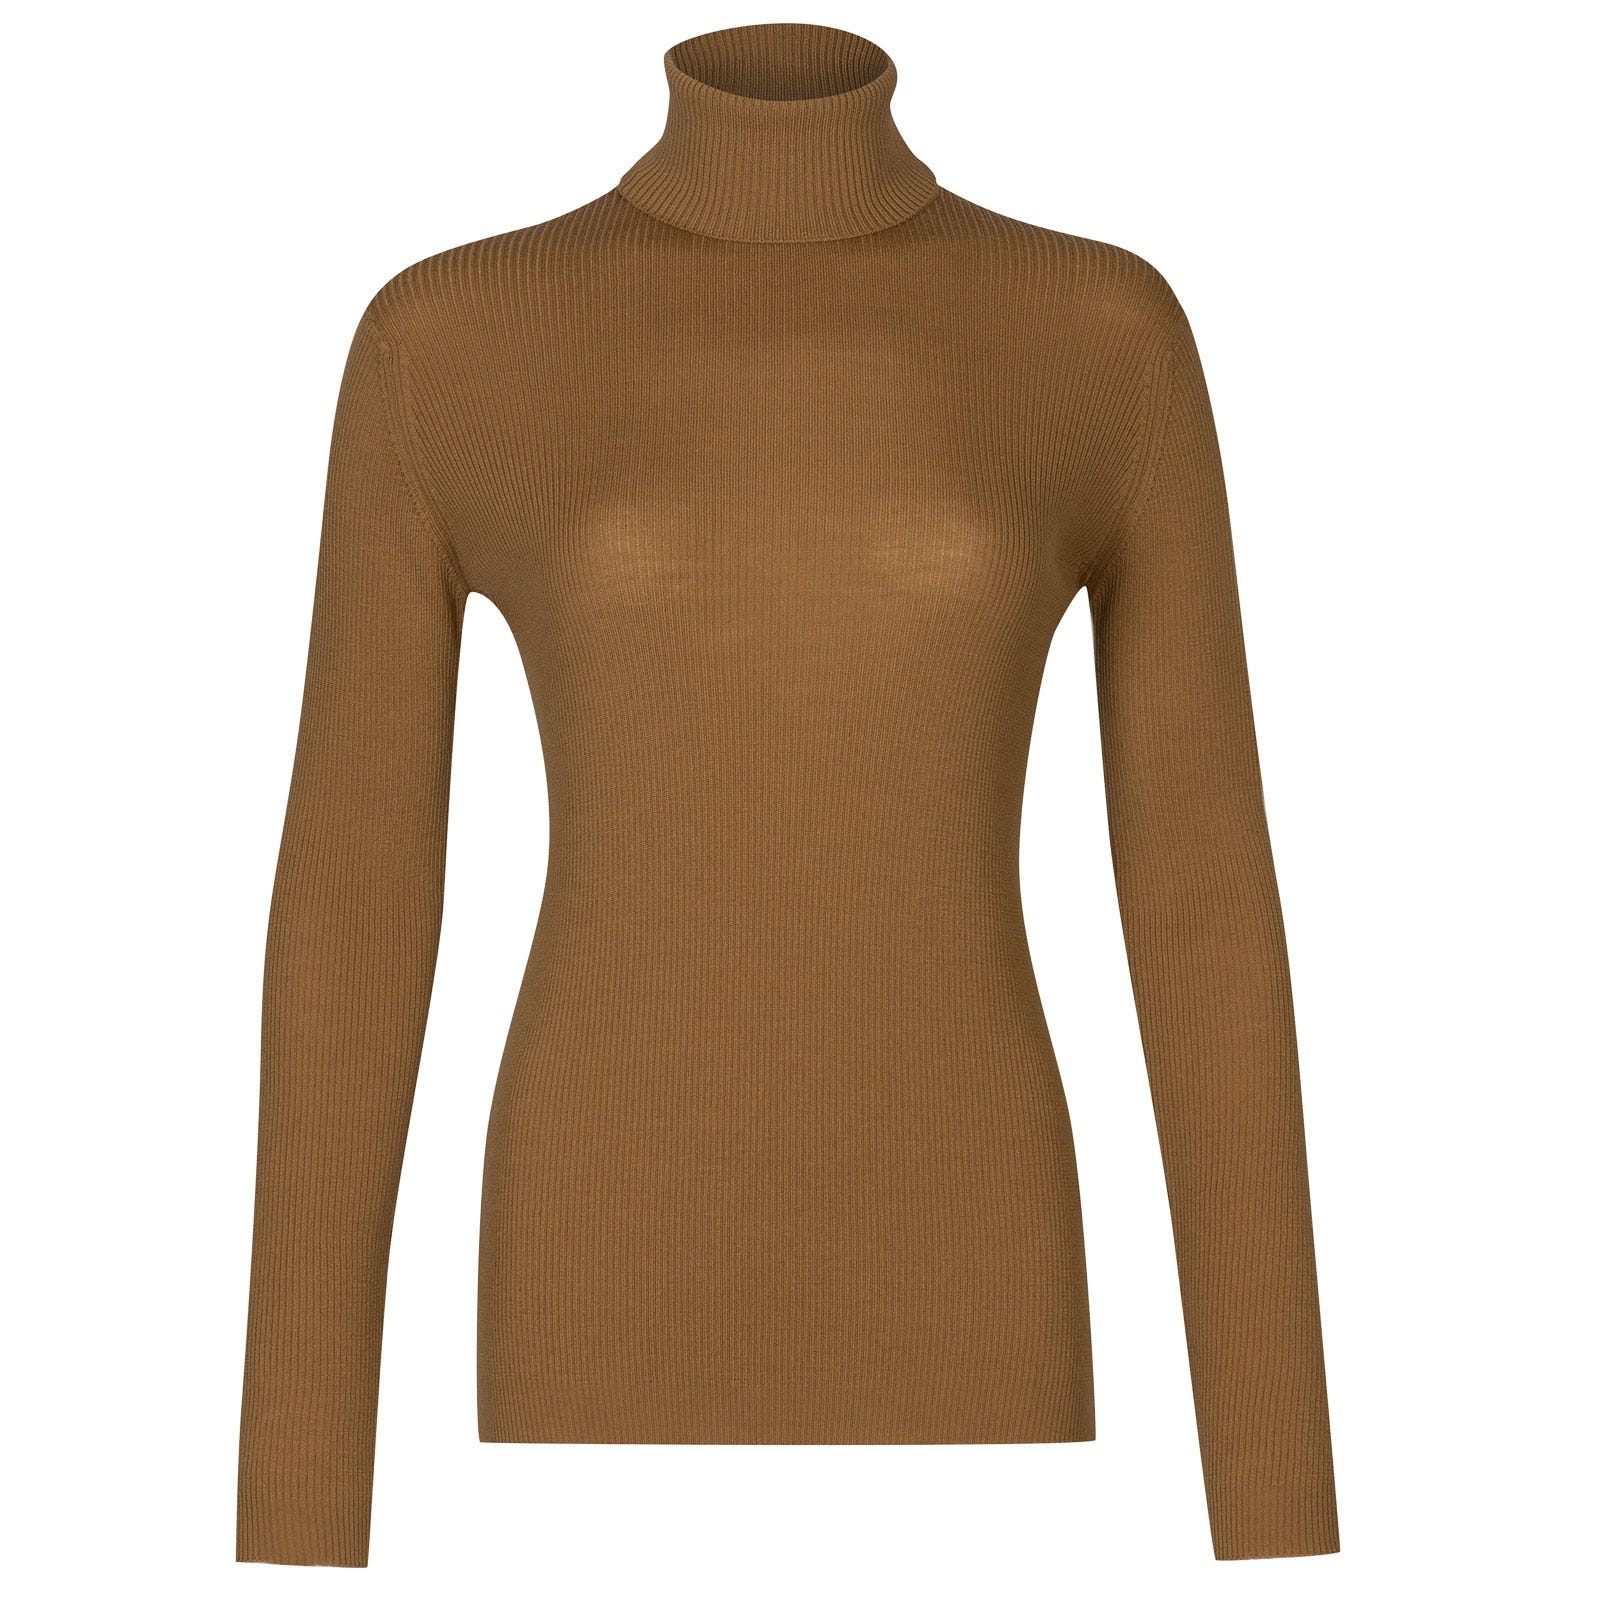 John Smedley massey Merino Wool Sweater in Camel-XL